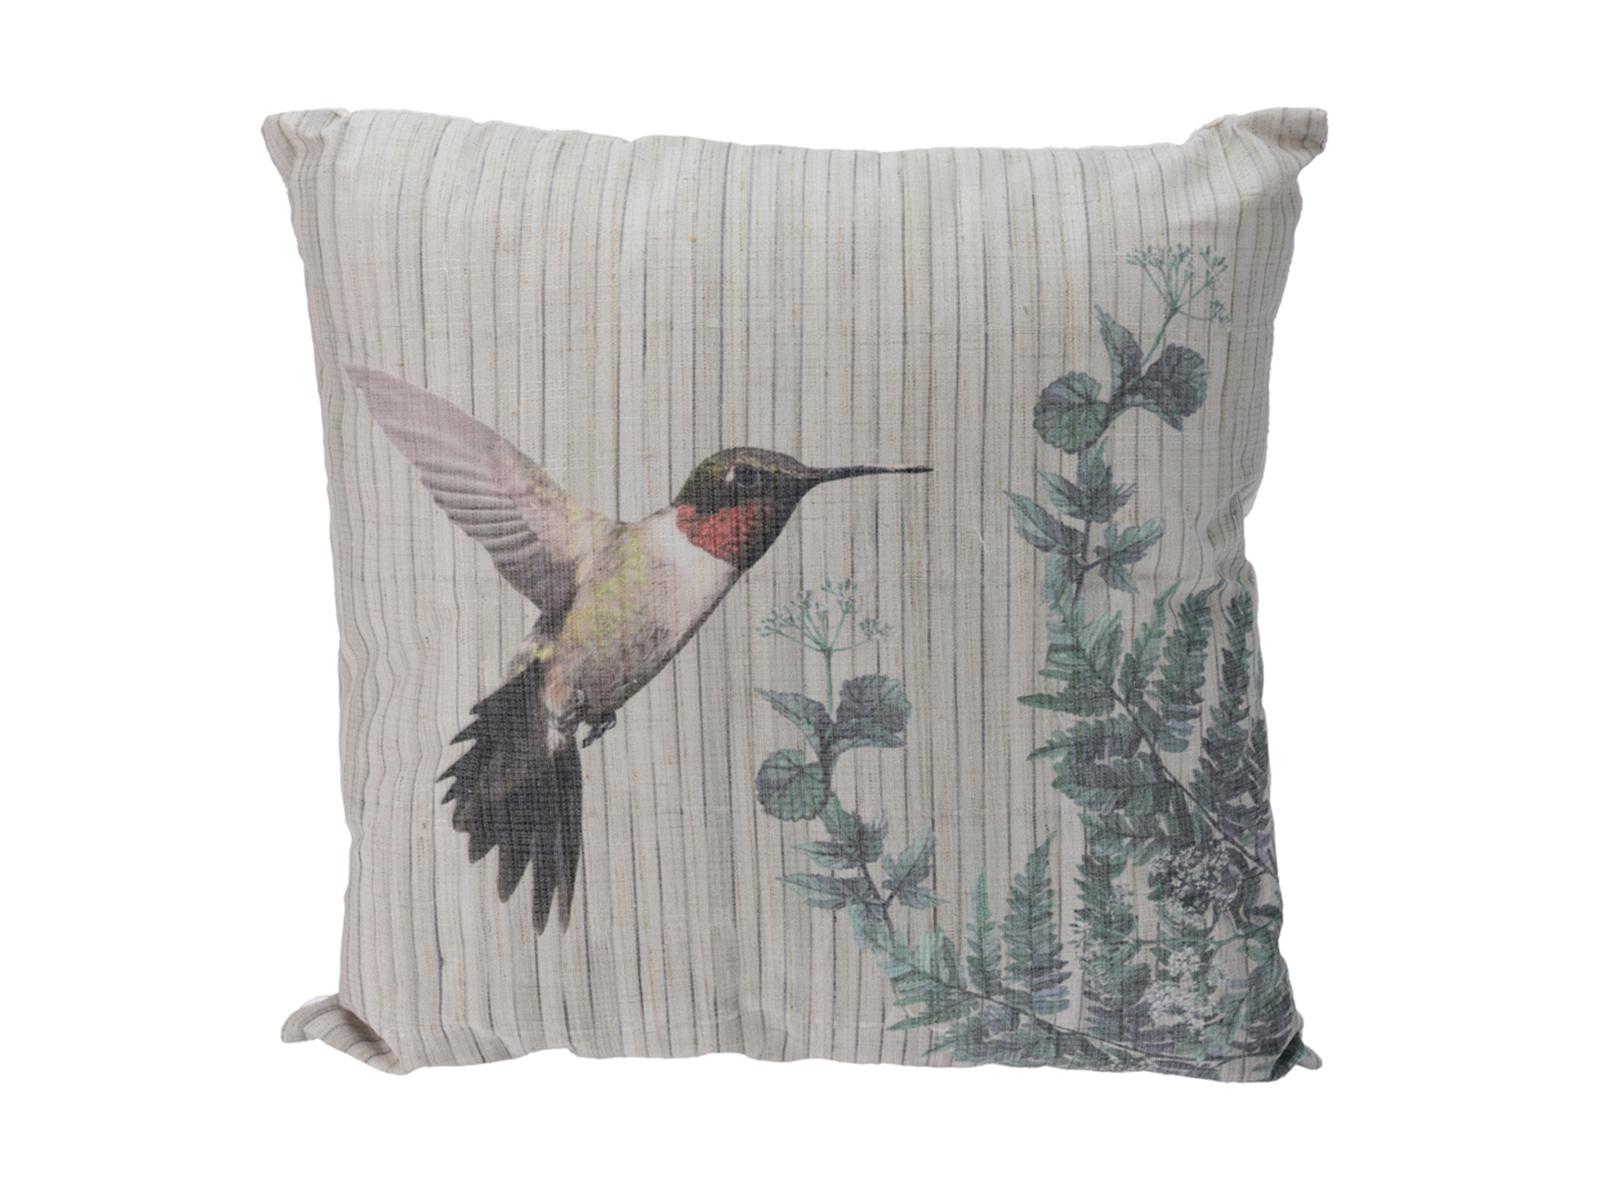 Подушка FloraДекоративные подушки<br>Декоративная подушка<br>